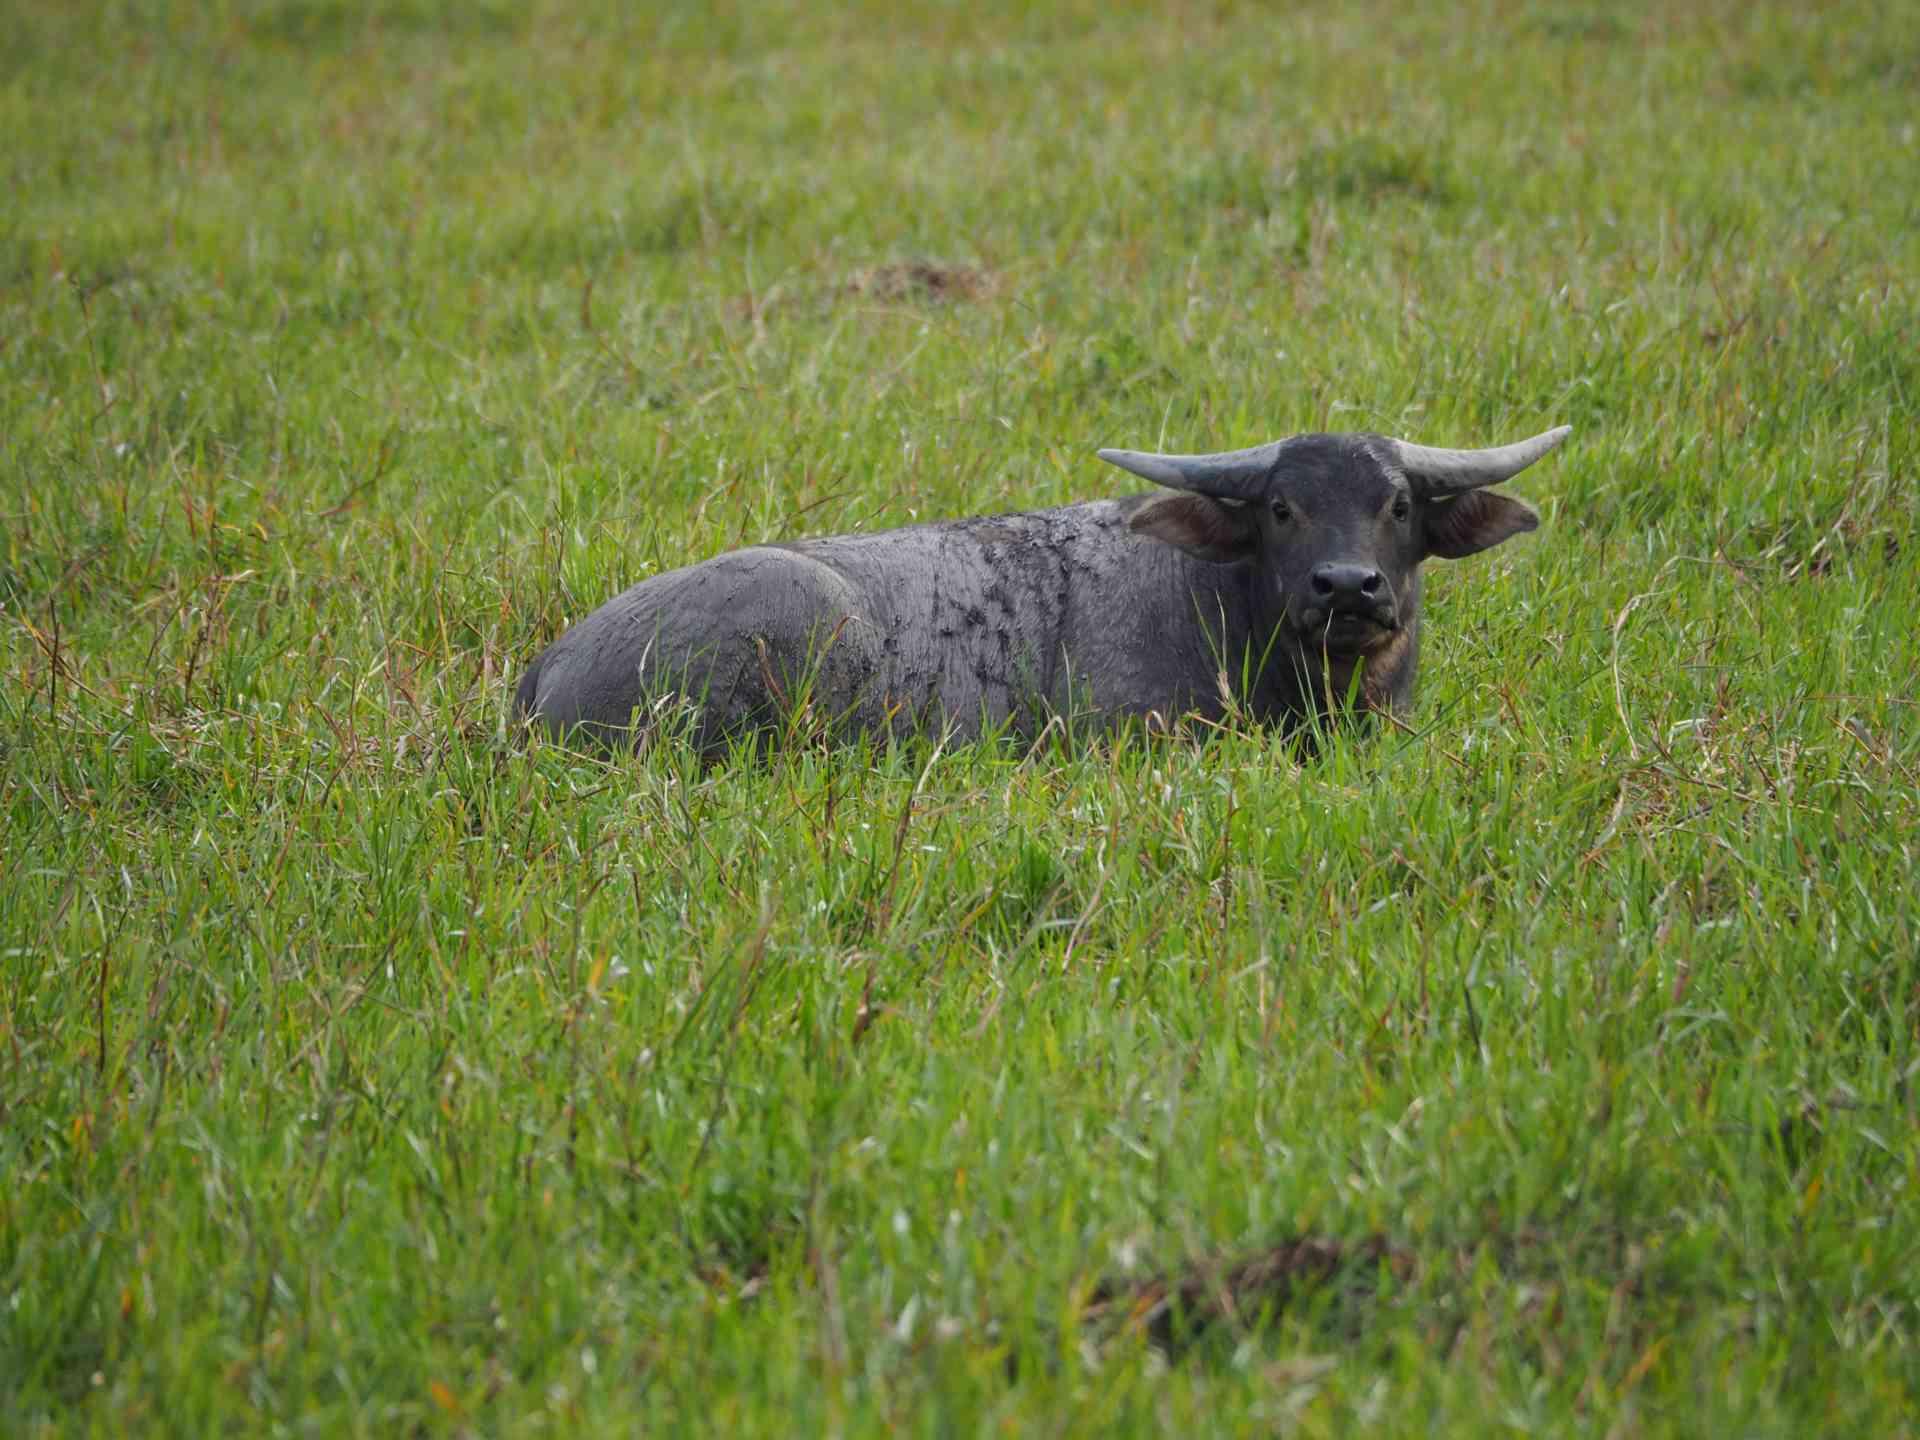 Water buffalo, Northern Territory by Annelieke Huijgens